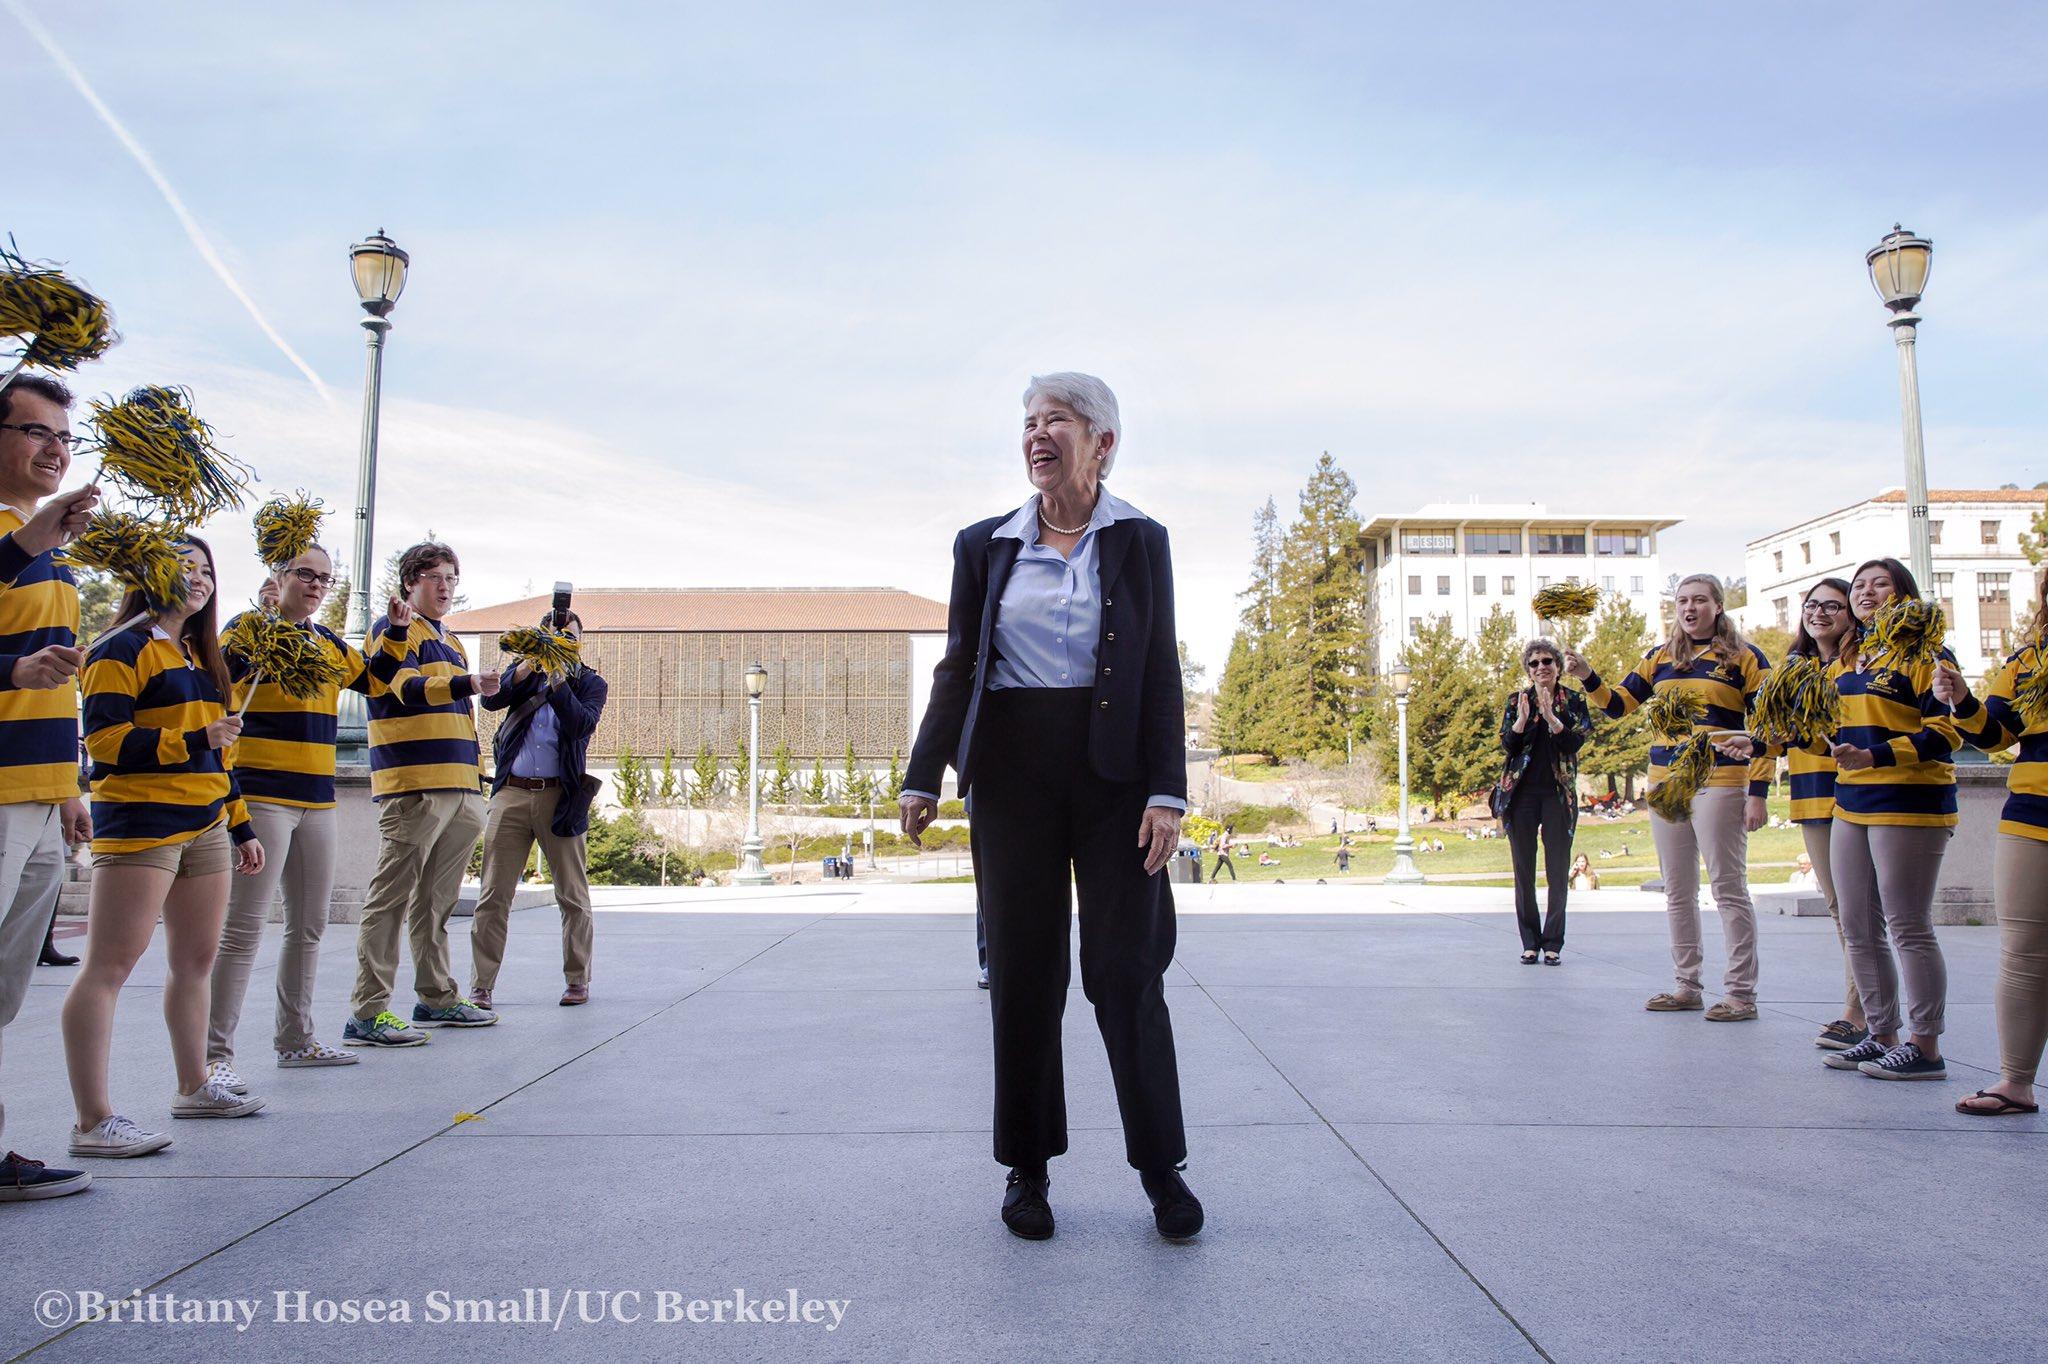 UC Berkeley celebrates the announcement of it's 11th chancellor, Carol Tecla Christ. @UCBerkeley https://t.co/VnWRpXkazJ